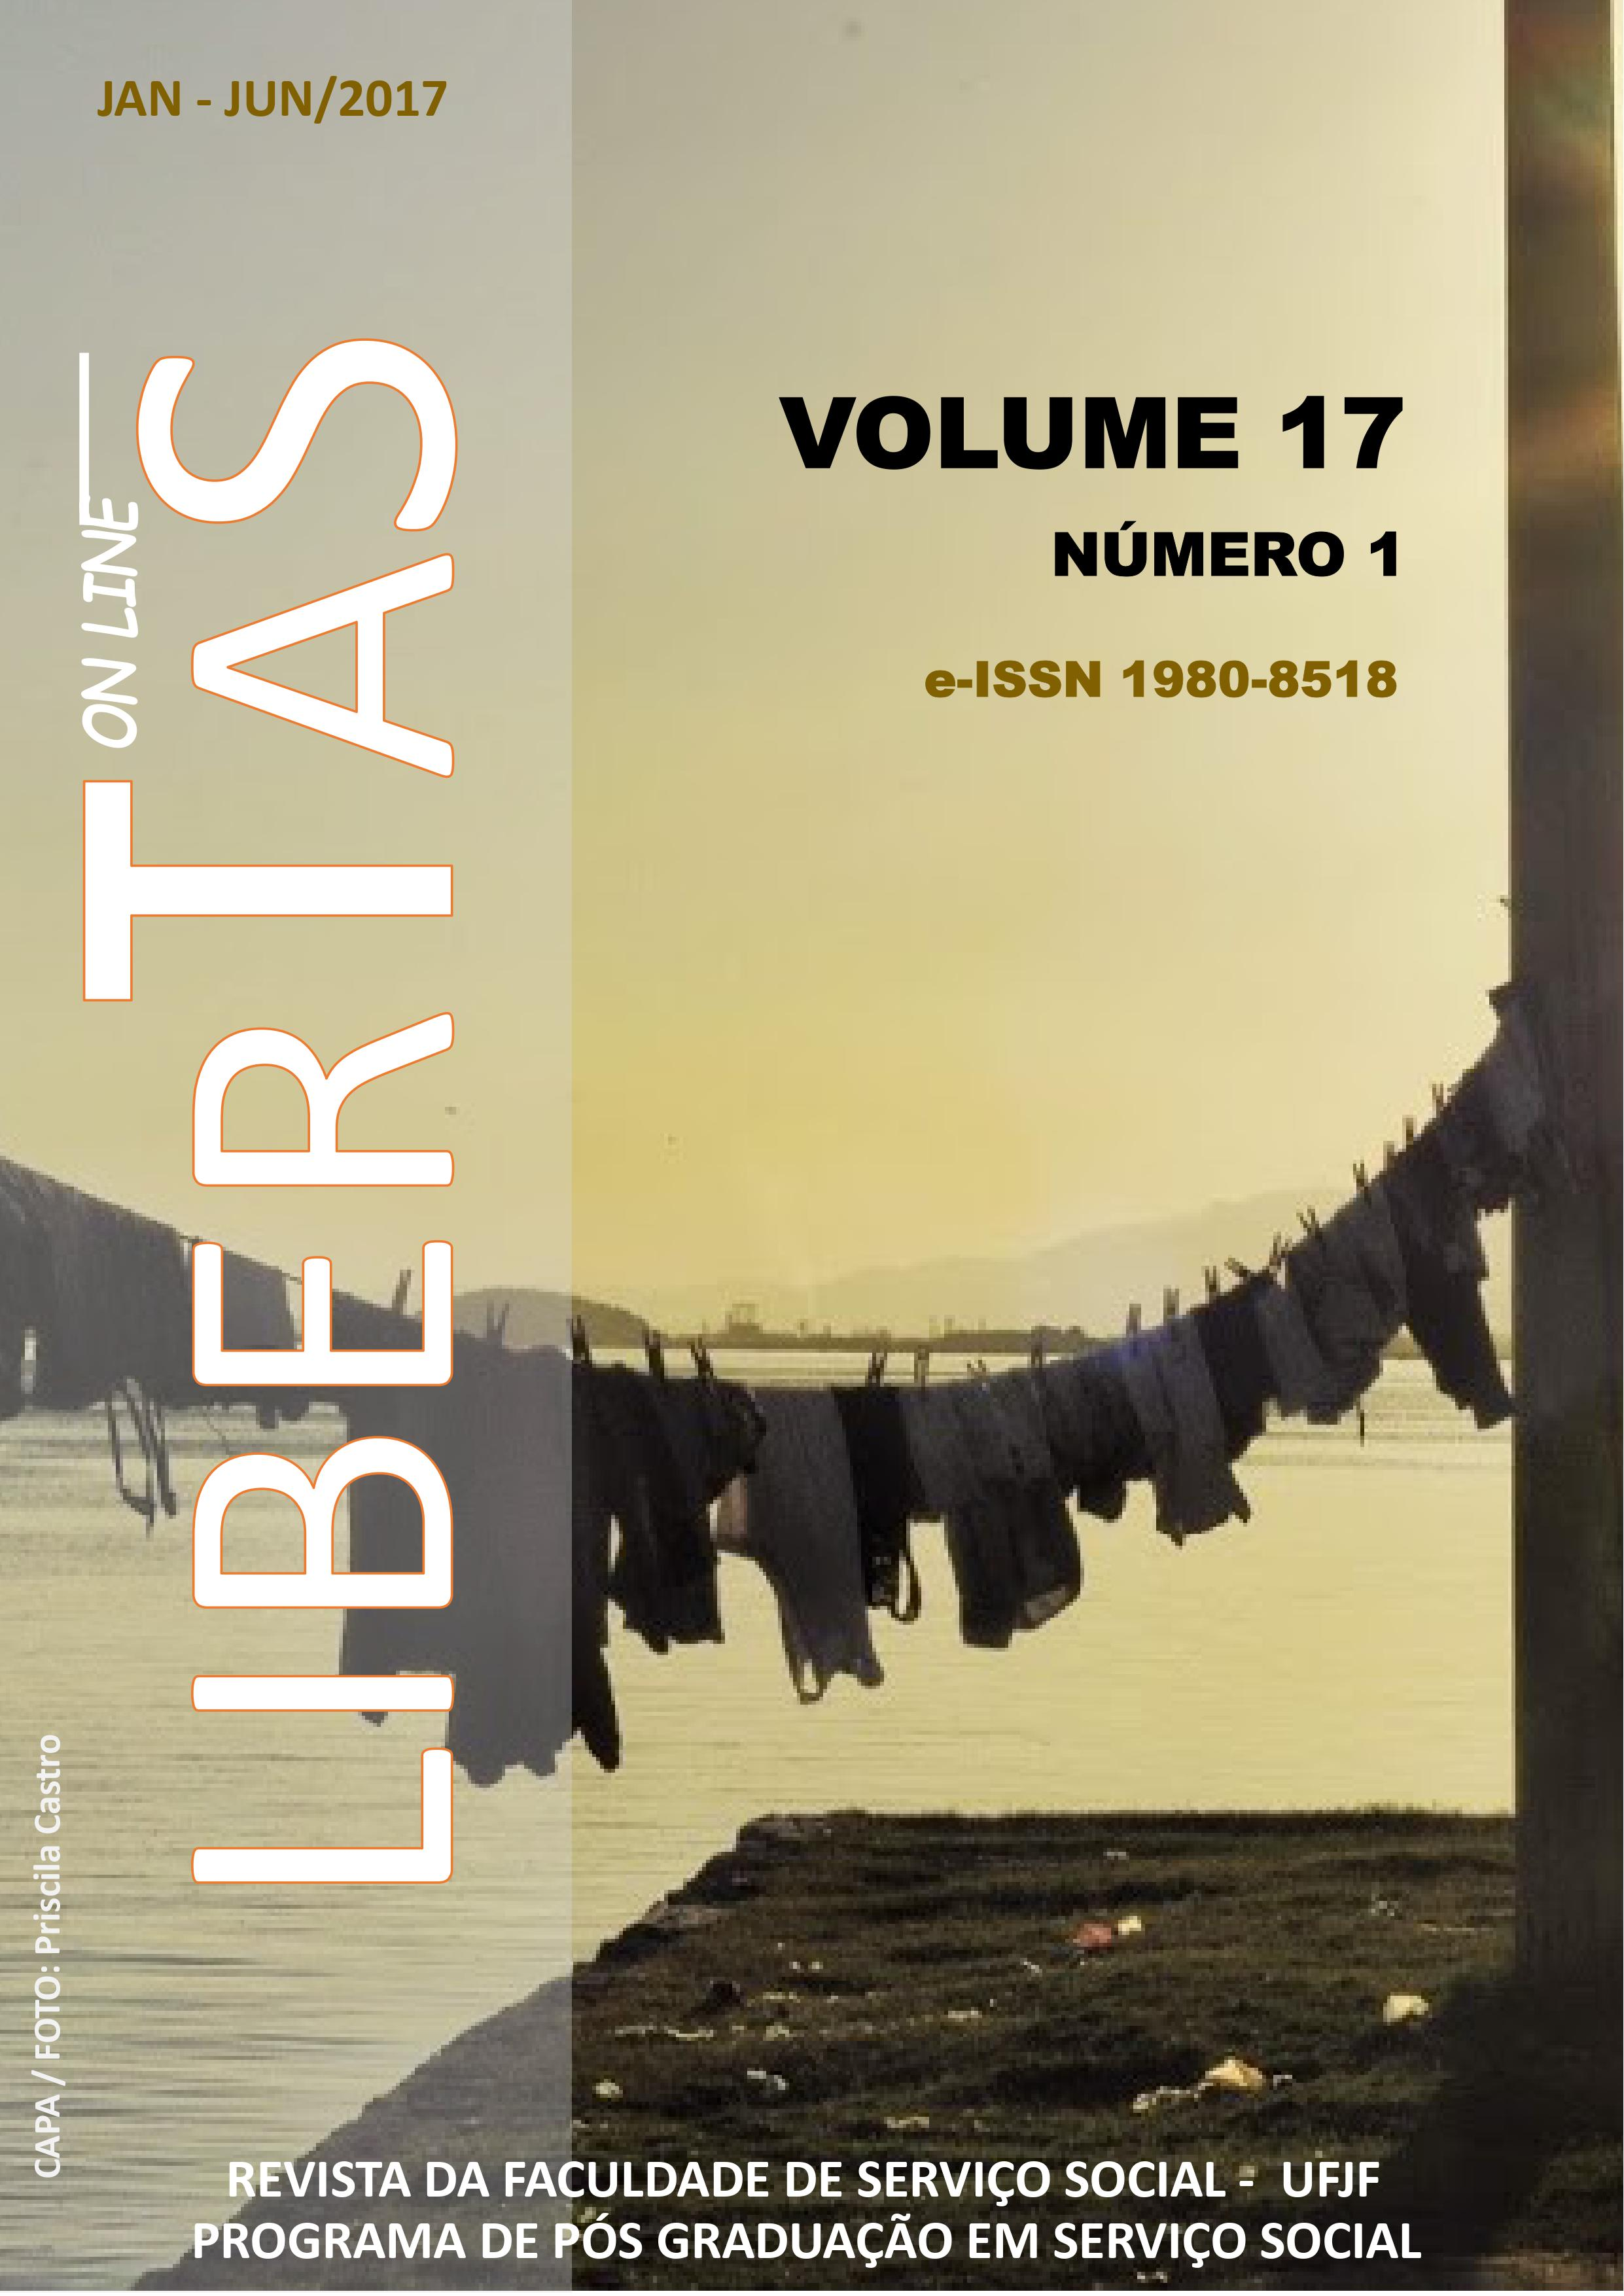 Visualizar v. 17 n. 1 (2017): Revista Libertas - ISSN: 1980-8518 (jan. jun. 2017)